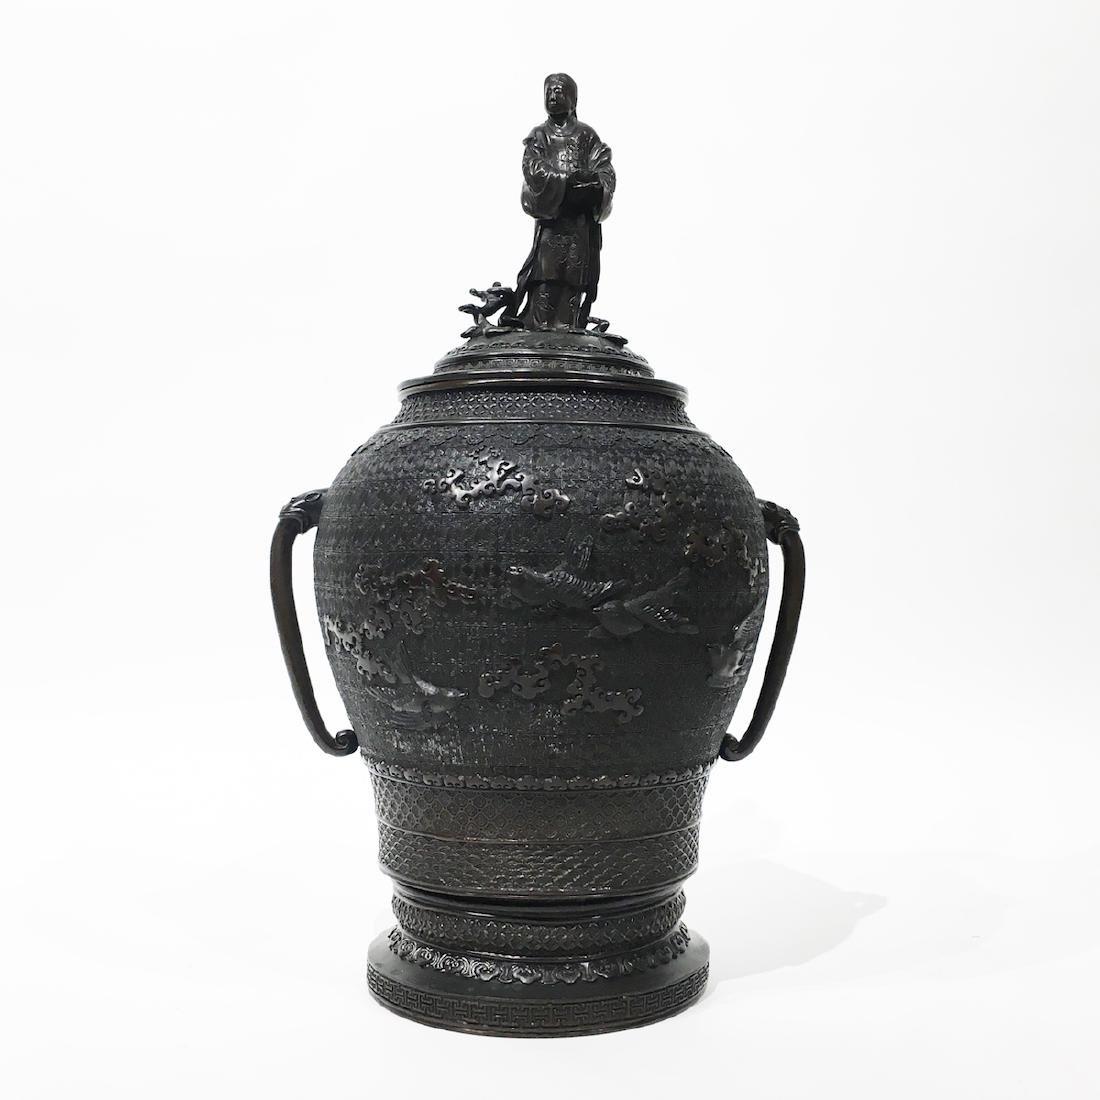 Japanese Bronze Covered Urn, Rojen Chu